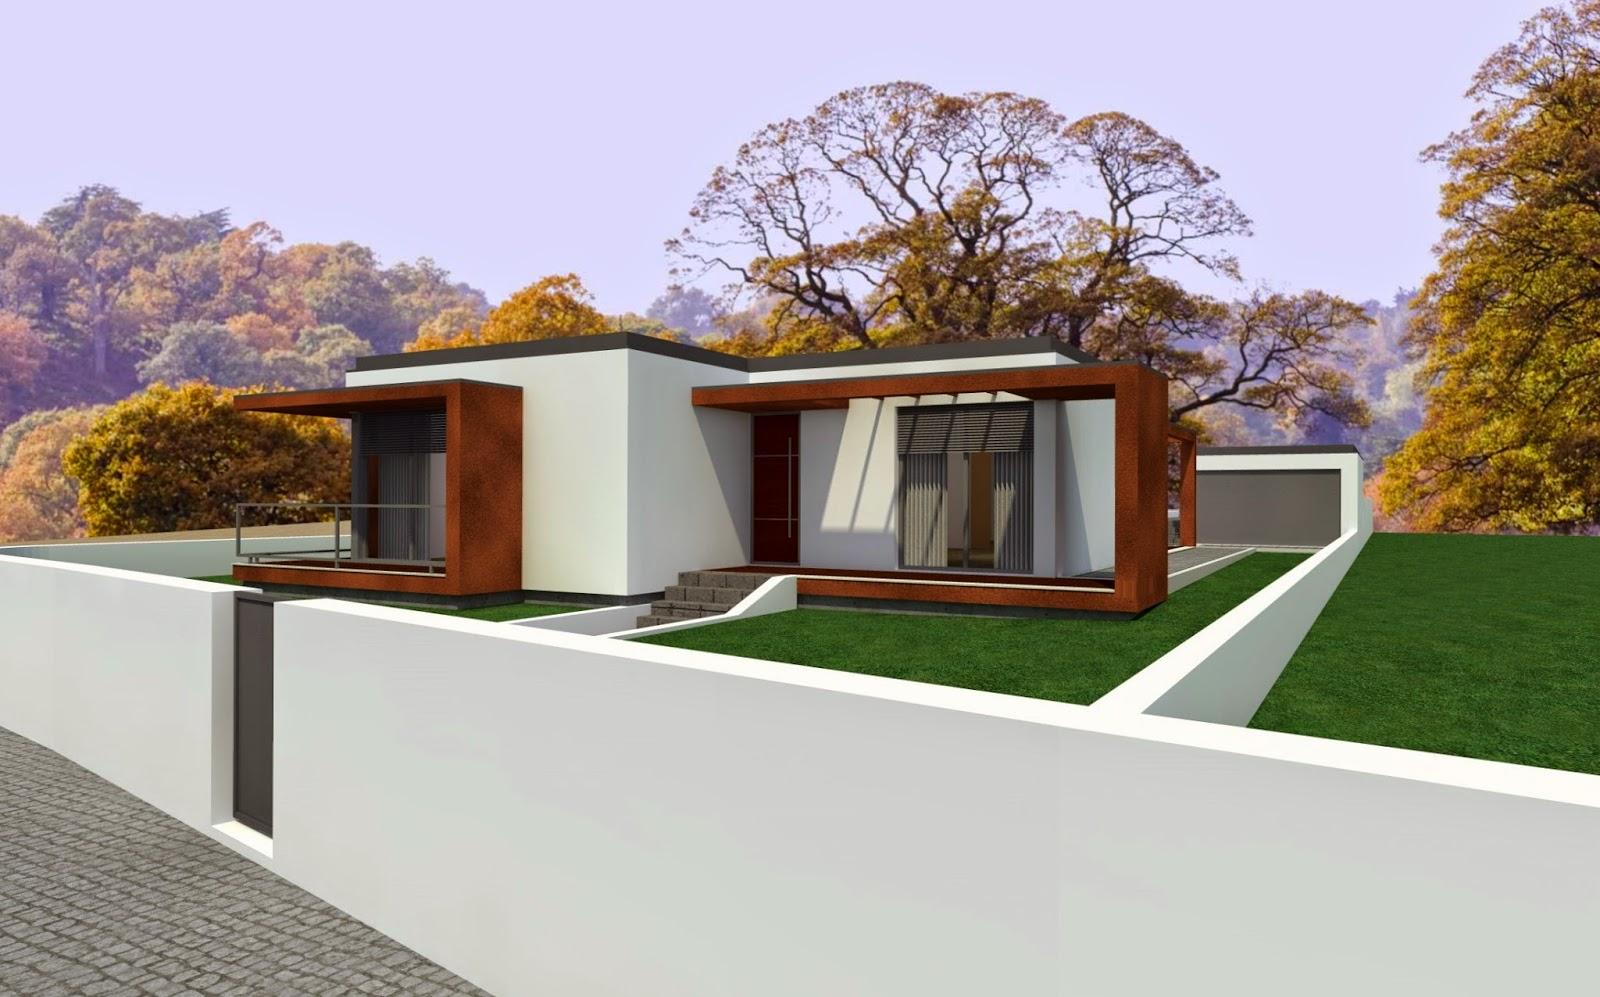 Casas modulares steel houses steel houses pias lousada - Casas modulares portugal ...